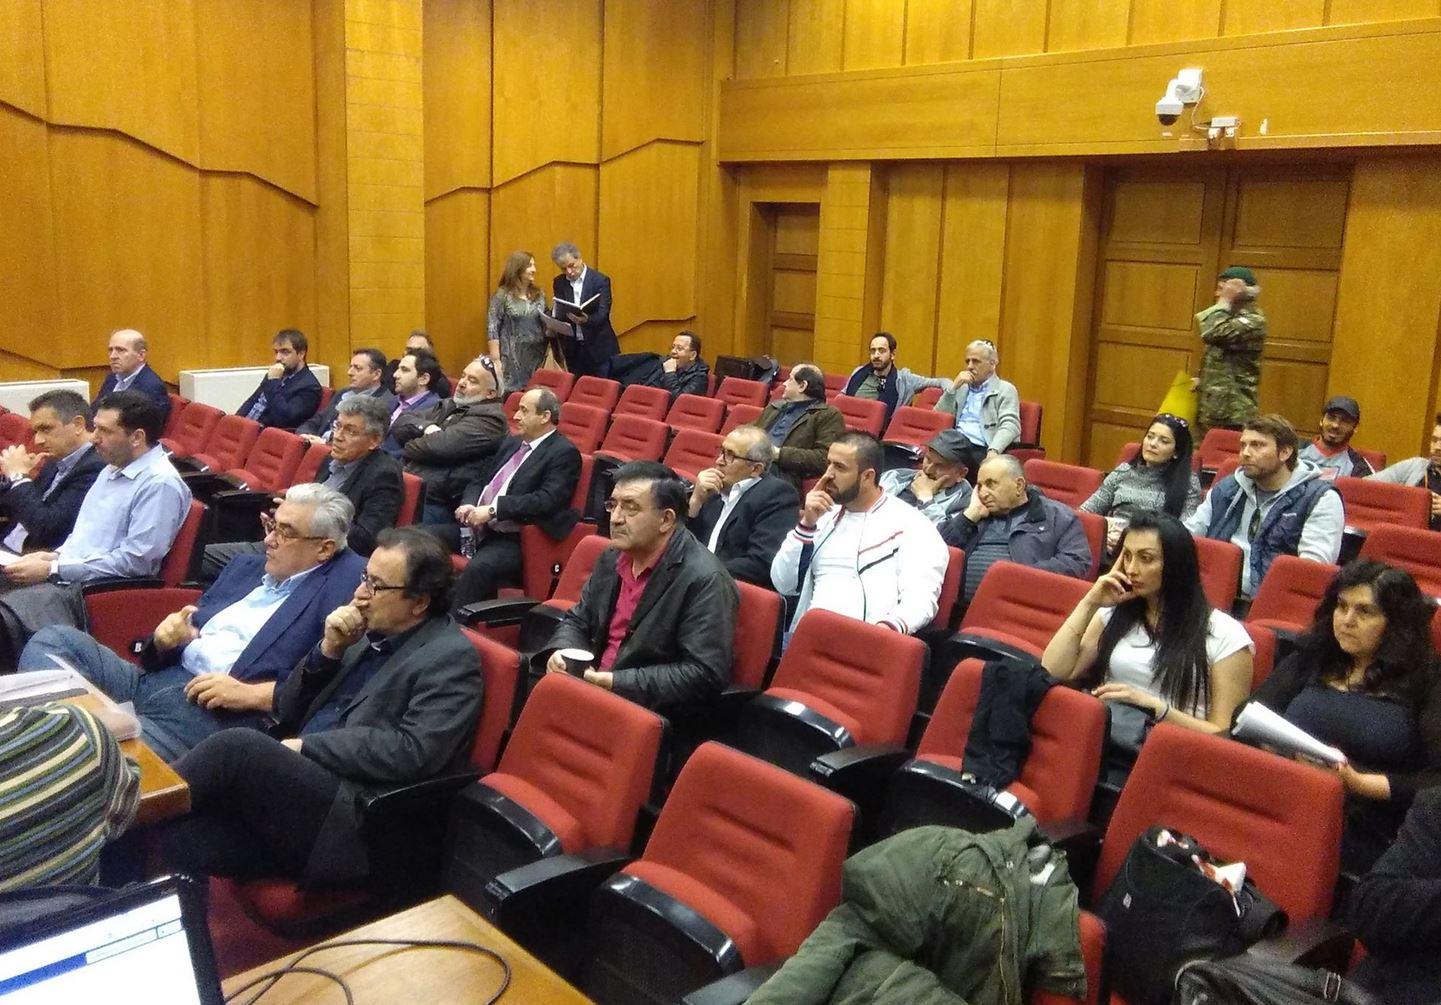 "kozan.gr: Περιφερειακό Συμβούλιο Δ. Μακεδονίας: Εκατέρωθεν ""καρφιά"" συμπολίτευσης – αντιπολίτευσης για τις ενεργειακές εξελίξεις και το ενδεχόμενο πώλησης μονάδων της ΔΕΗ – Zητήθηκε, από την Γ. Ζεμπιλιάδου, να συζητηθεί, το θέμα, εκτός ημερησίας διάταξης, όμως μετά από ψηφοφορία το αίτημα απορρίφθηκε  (Βίντεο)"